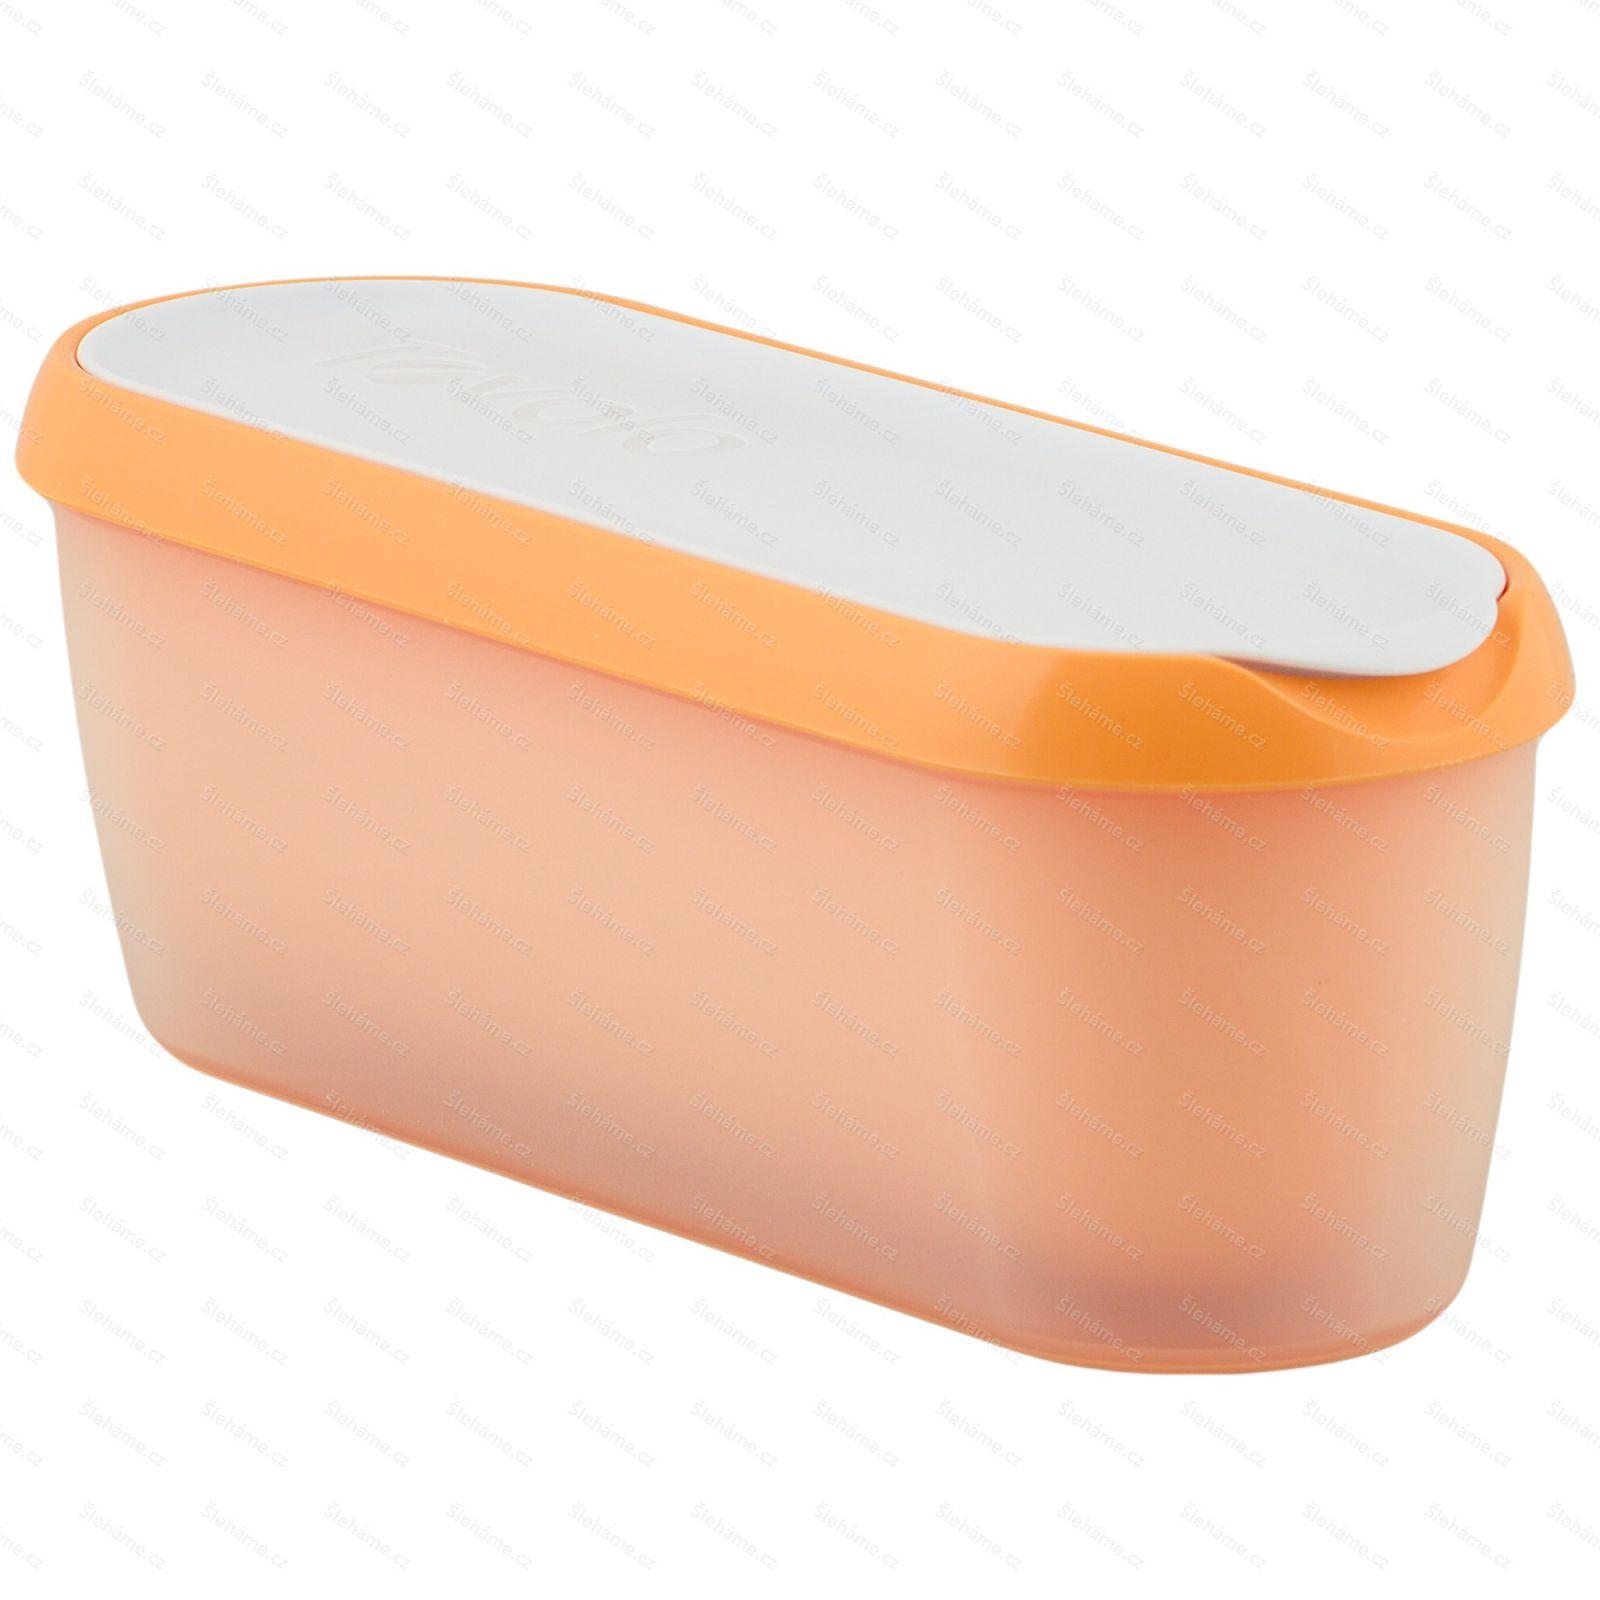 Box na zmrzlinu Tovolo GLIDE-A-SCOOP 1.4 l, pomerančový